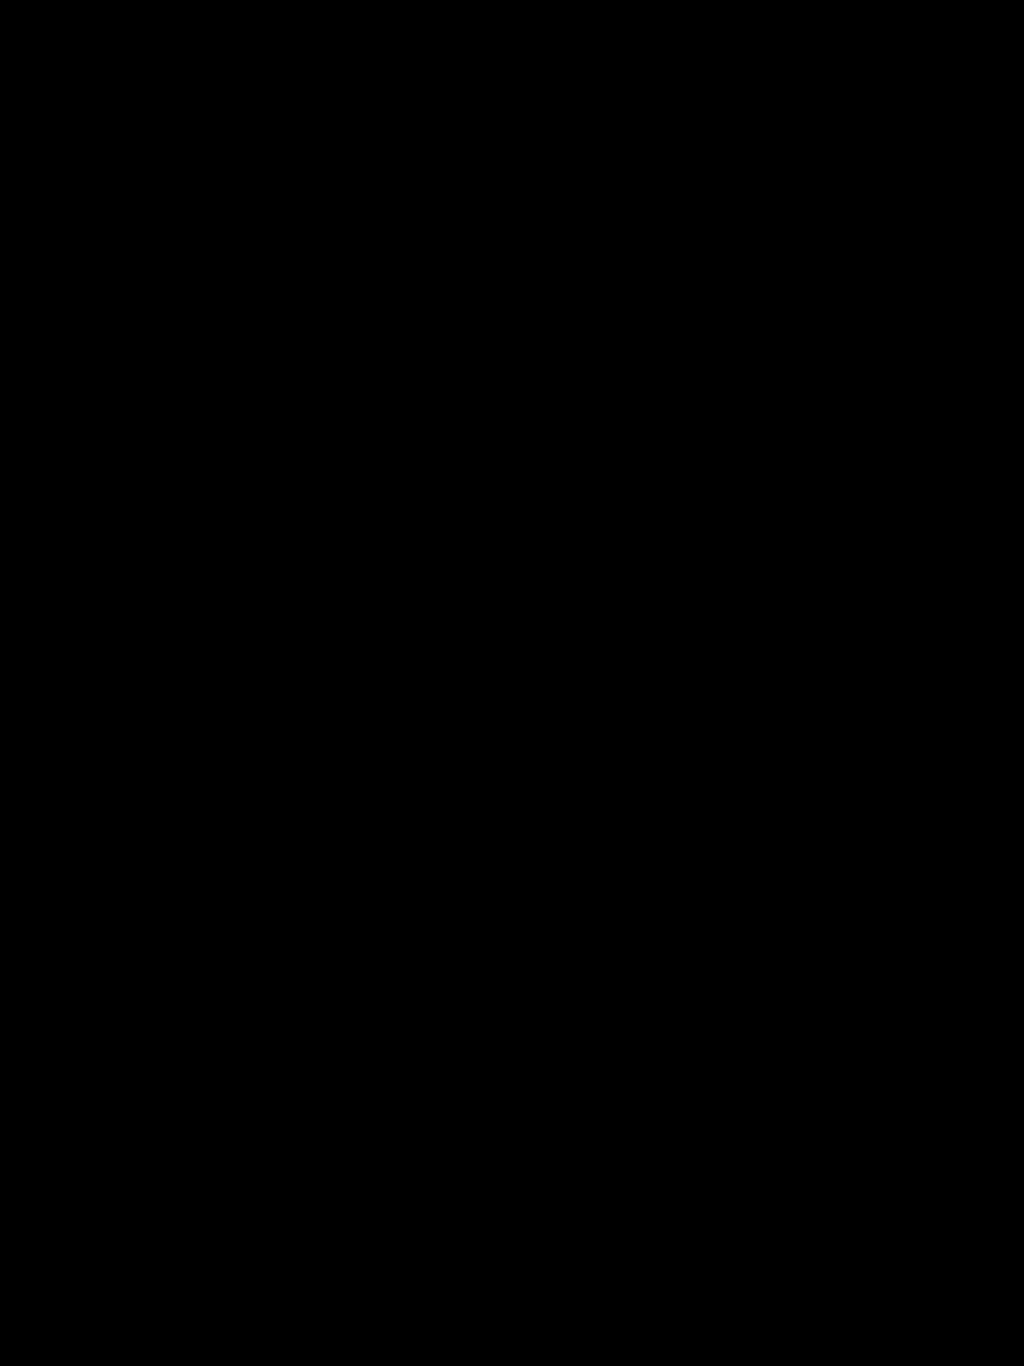 Unique cdr . Clipart cross silhouette